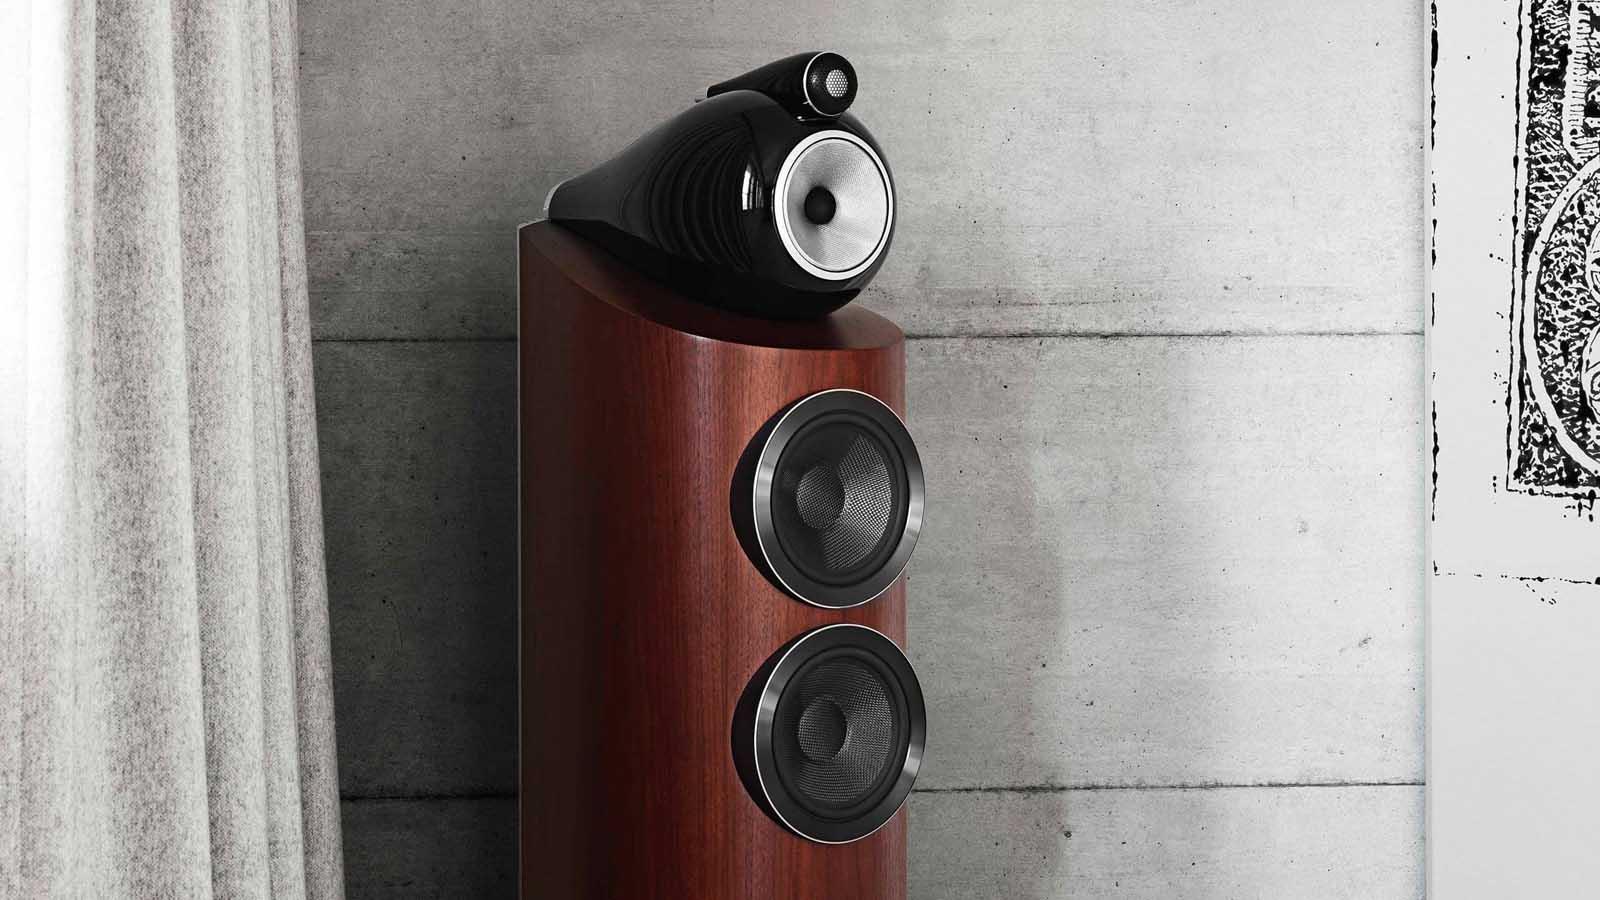 https://lamarque.fillion.ca/wp-content/uploads/2019/04/4-2-d-803-d3-803-series-diamond-speakers-rosenut_0.jpg